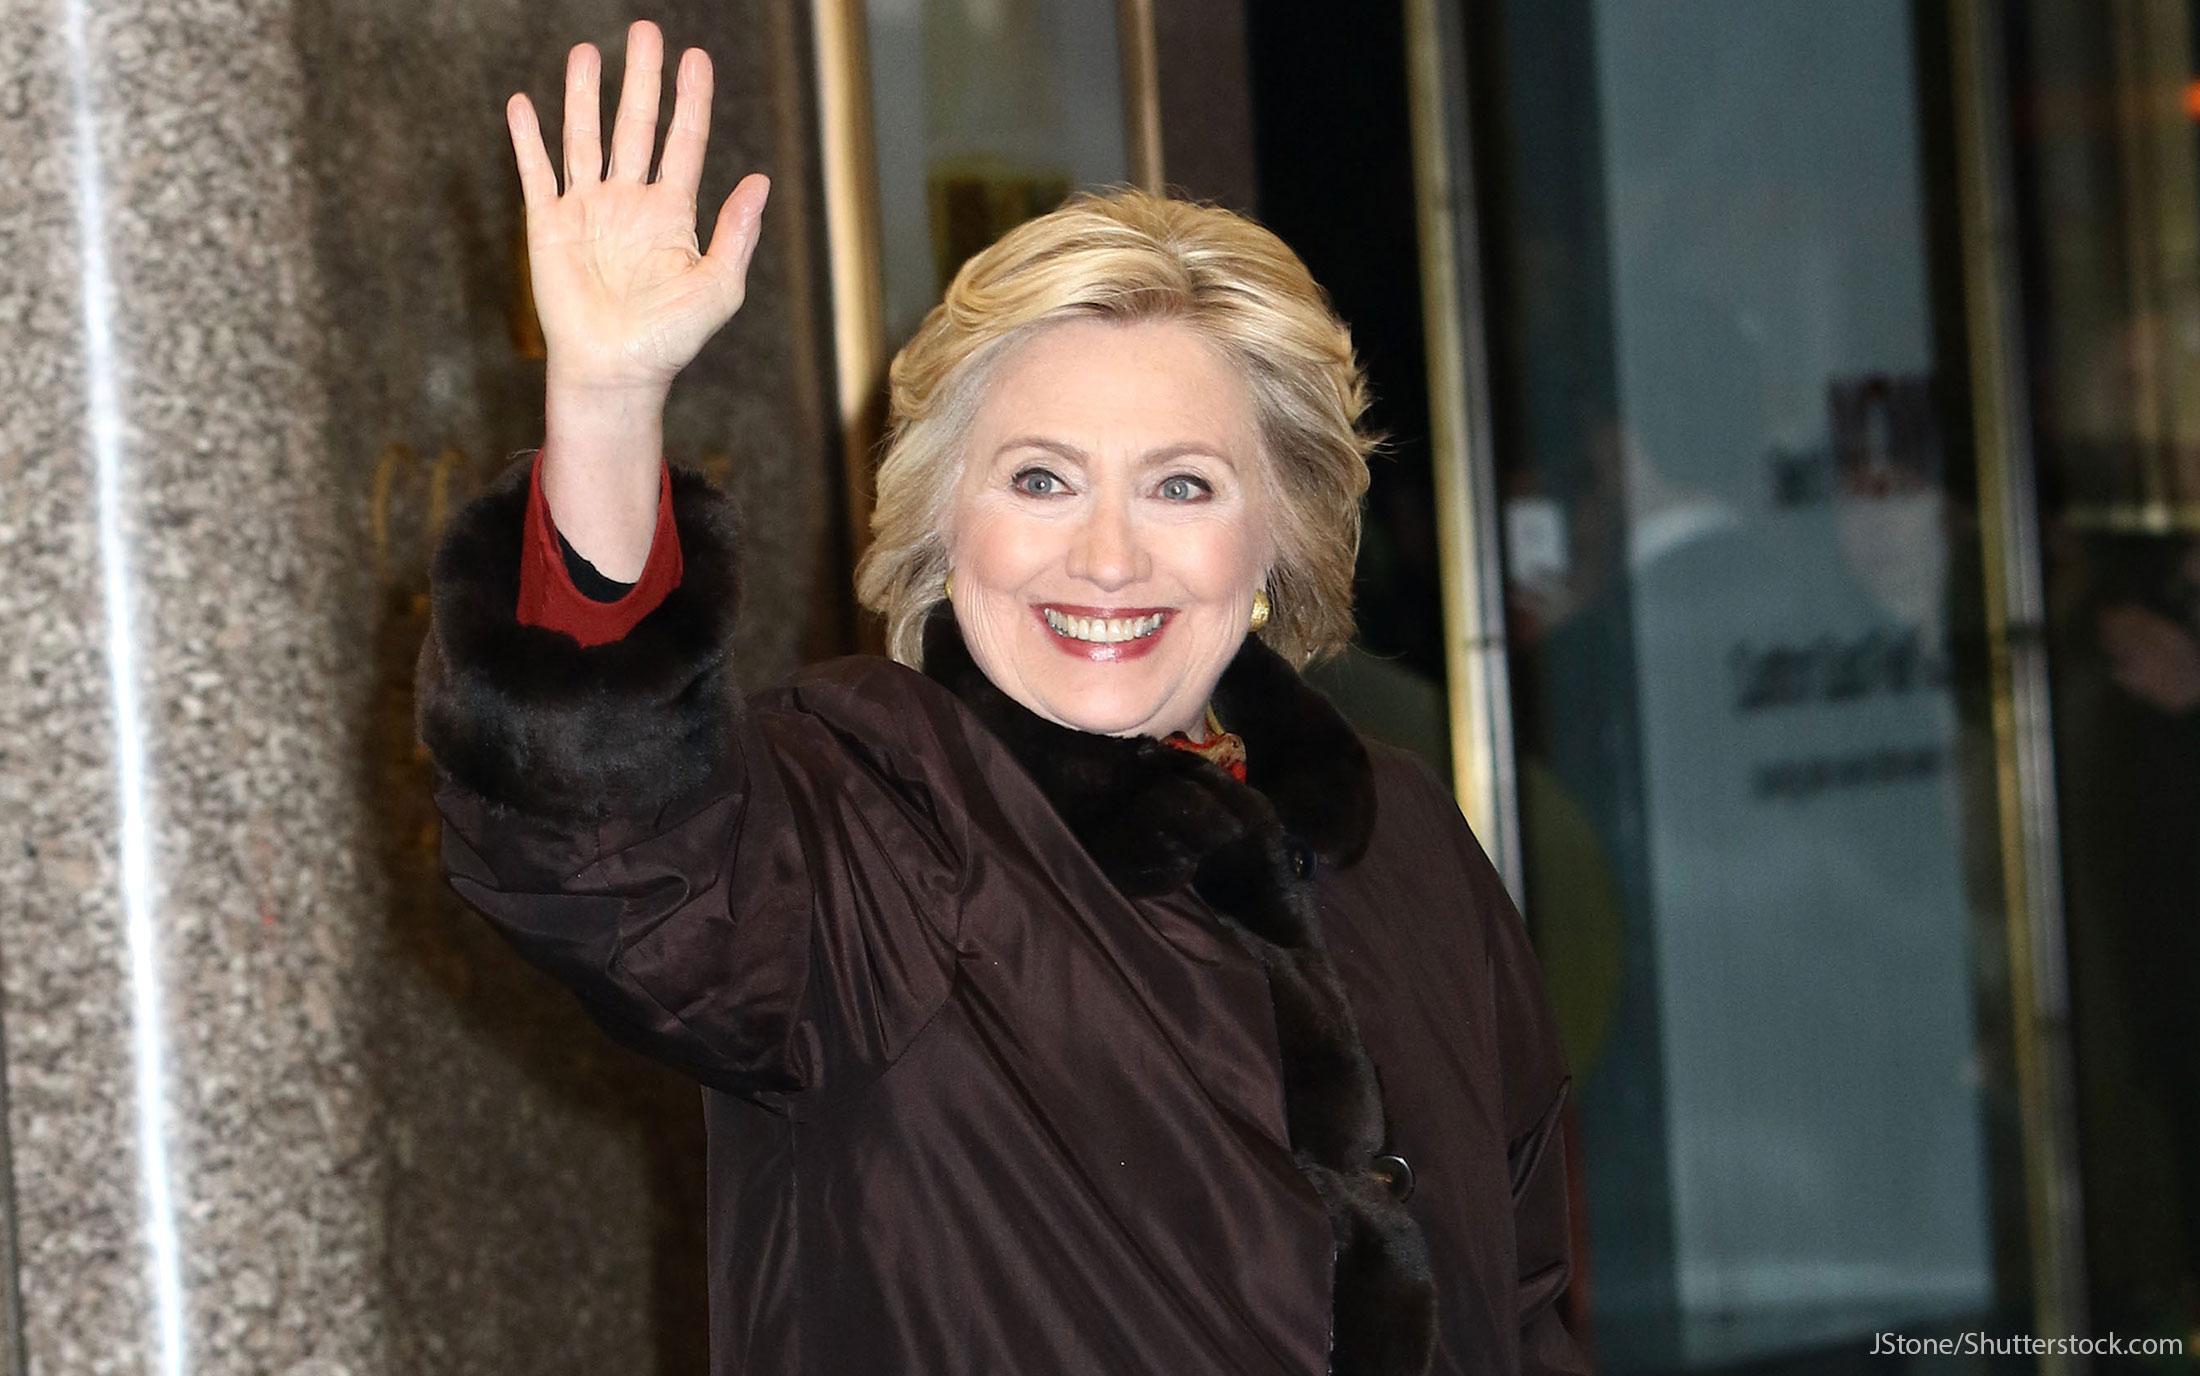 Hillary Clinton spending